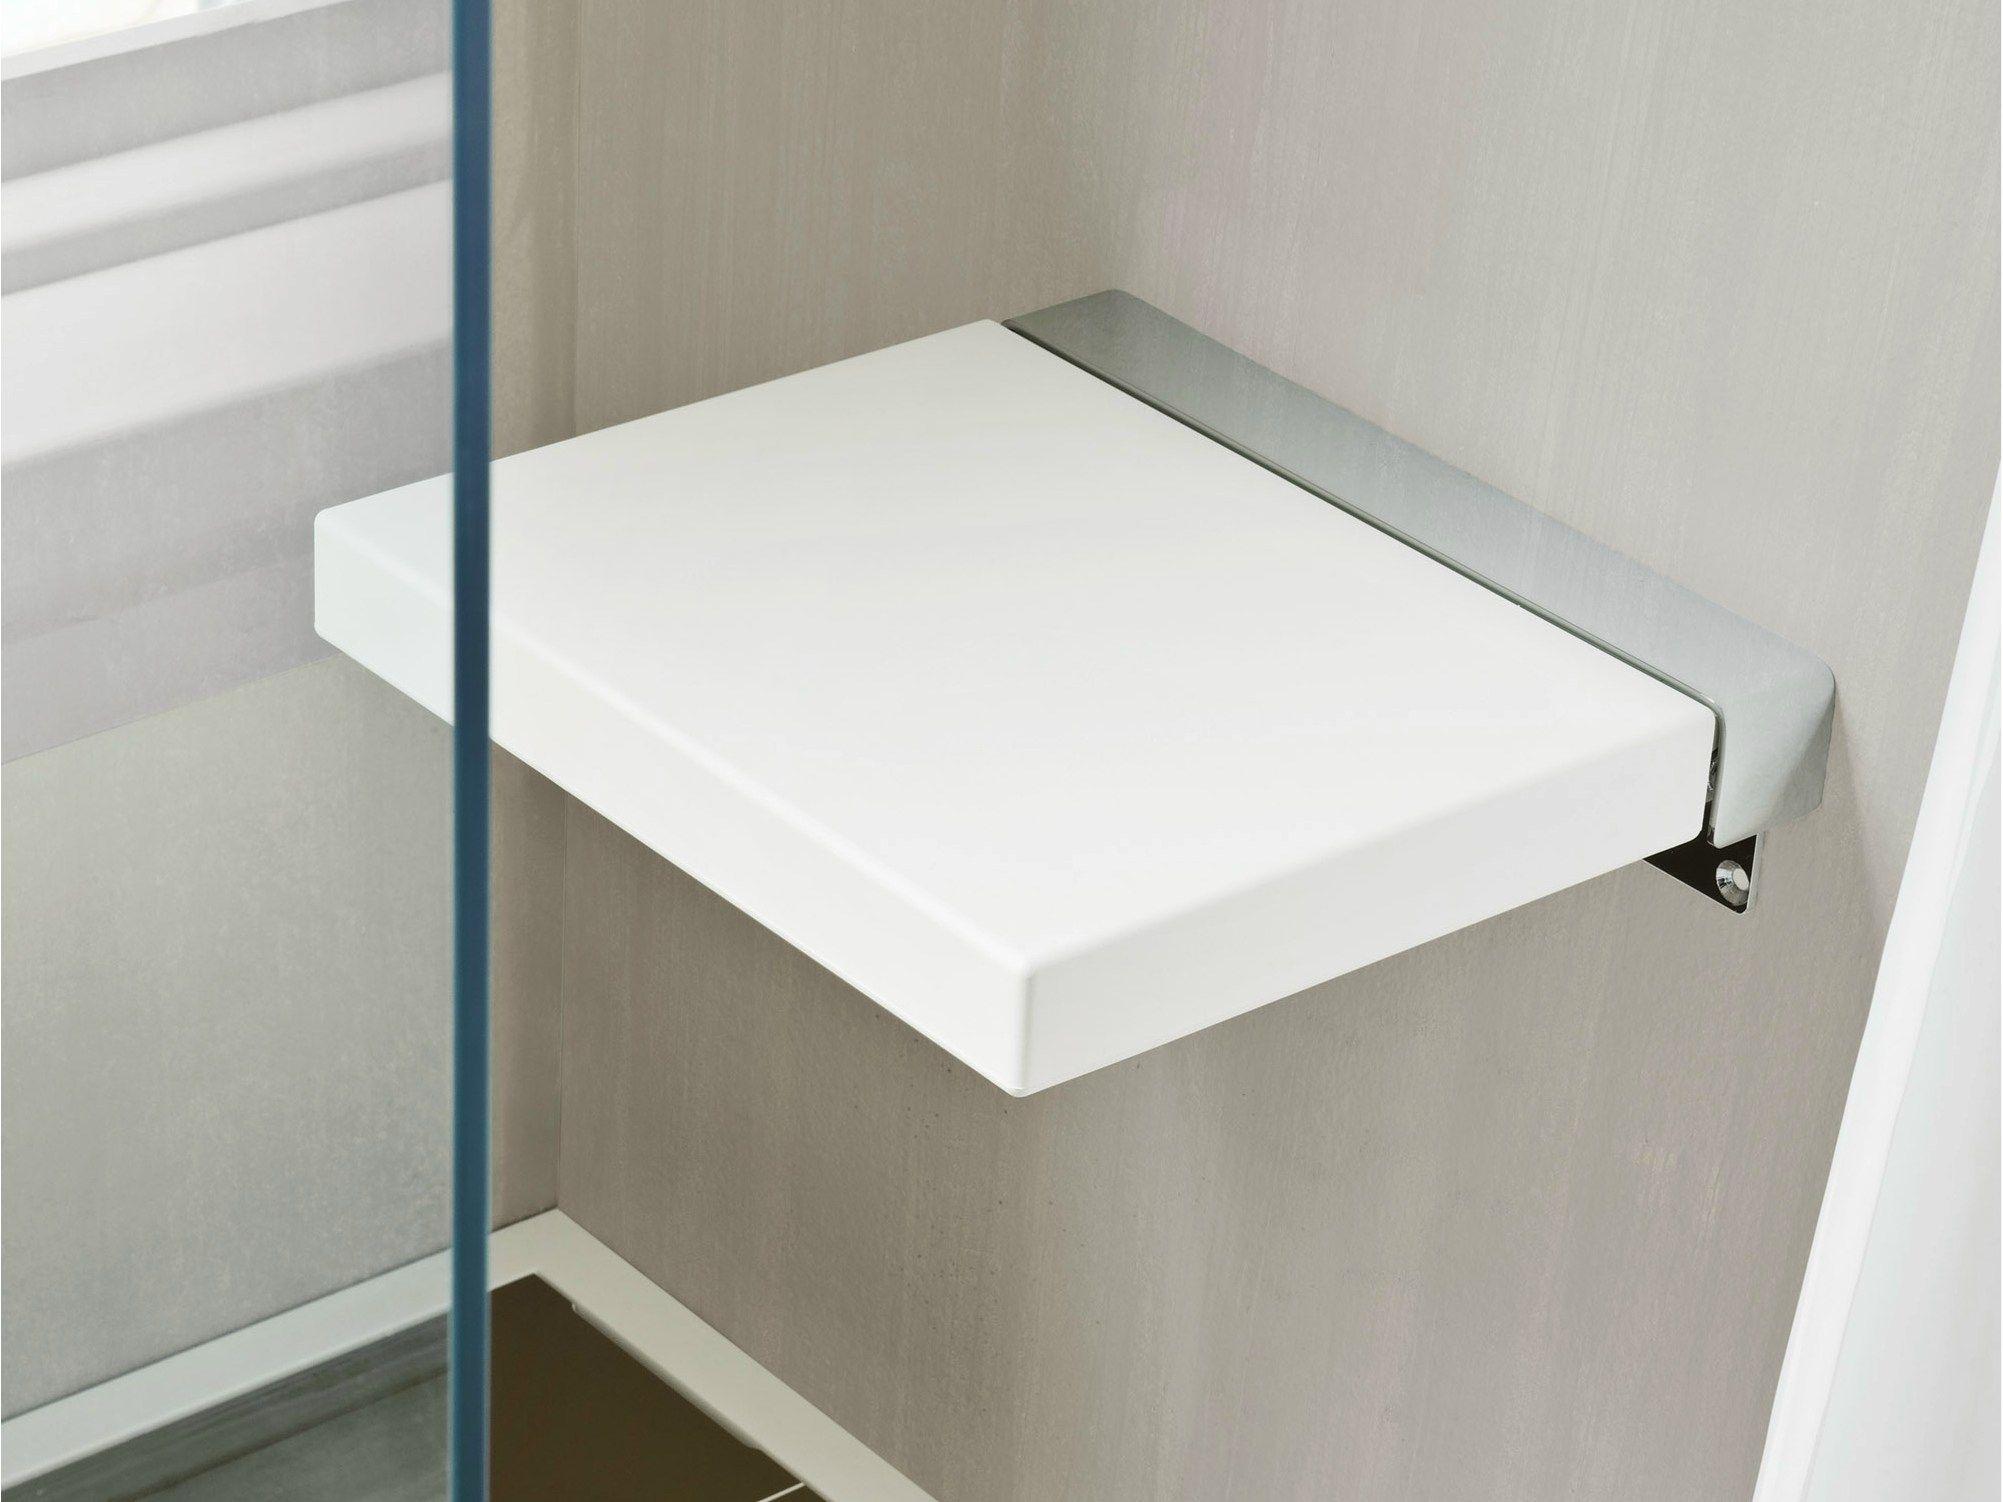 Giano sedile doccia by rexa design design imago design for Sgabello bagno design